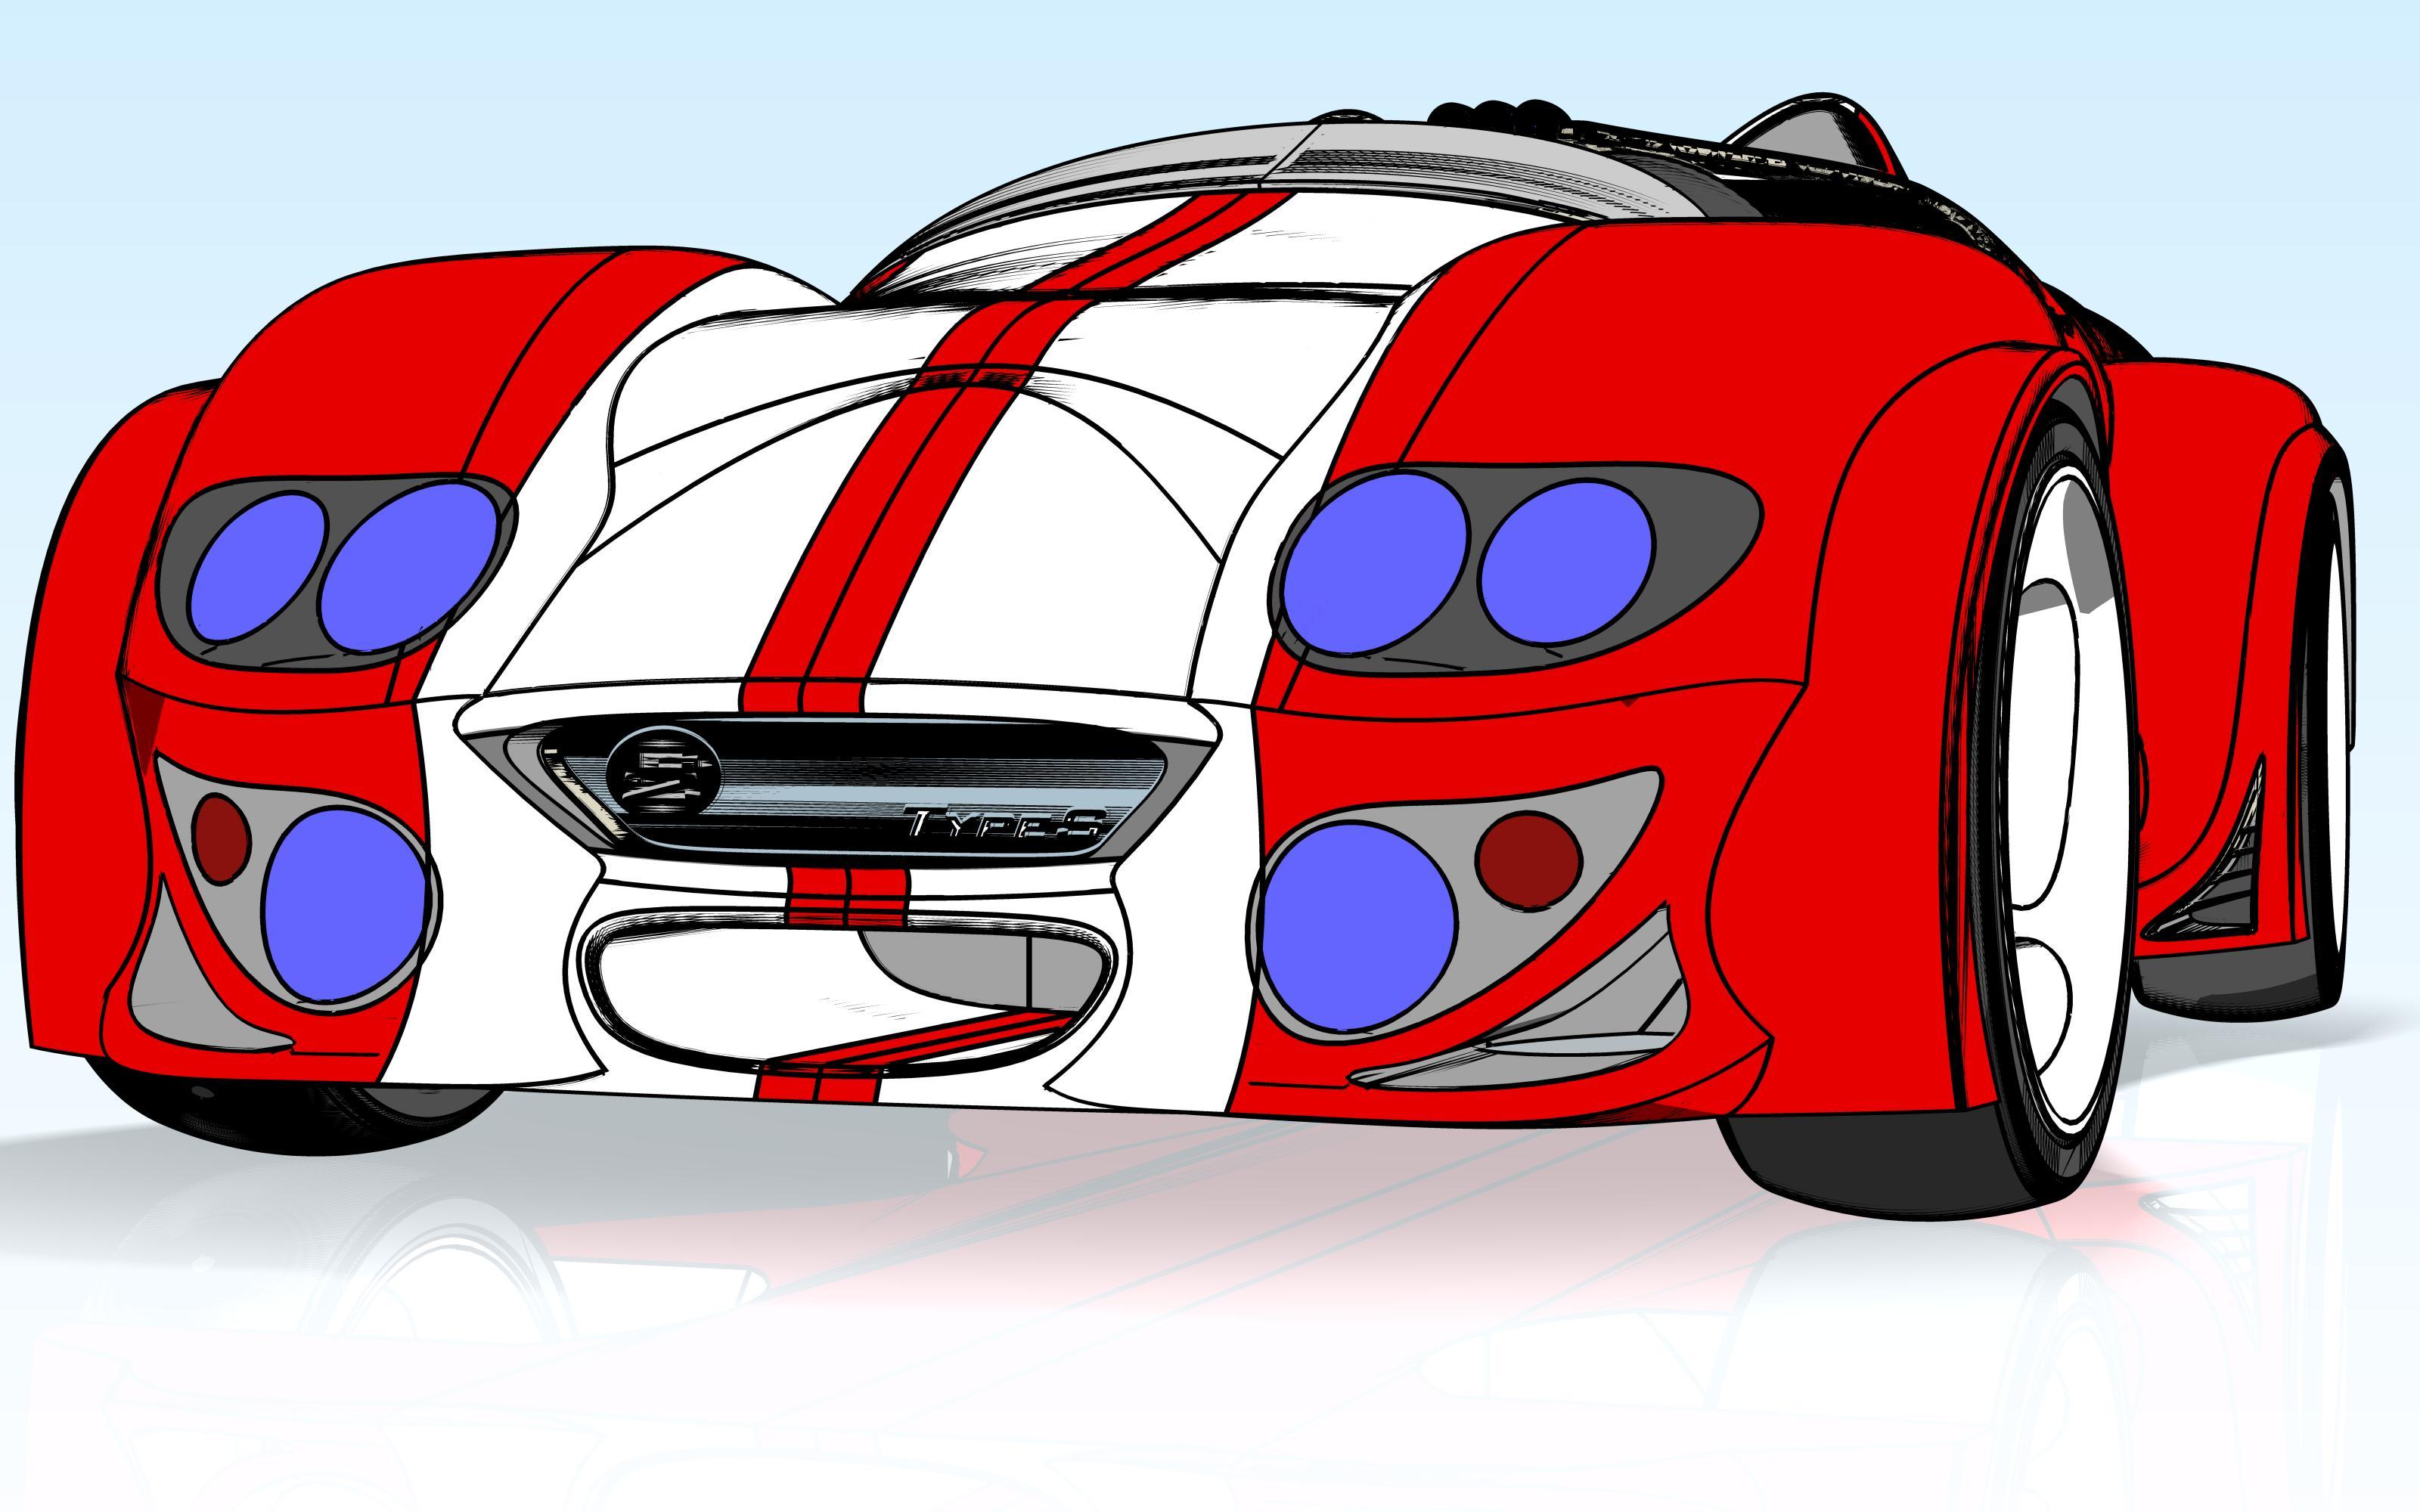 Free Cartoon Race Car, Download Free Cartoon Race Car png ... (3200 x 2000 Pixel)